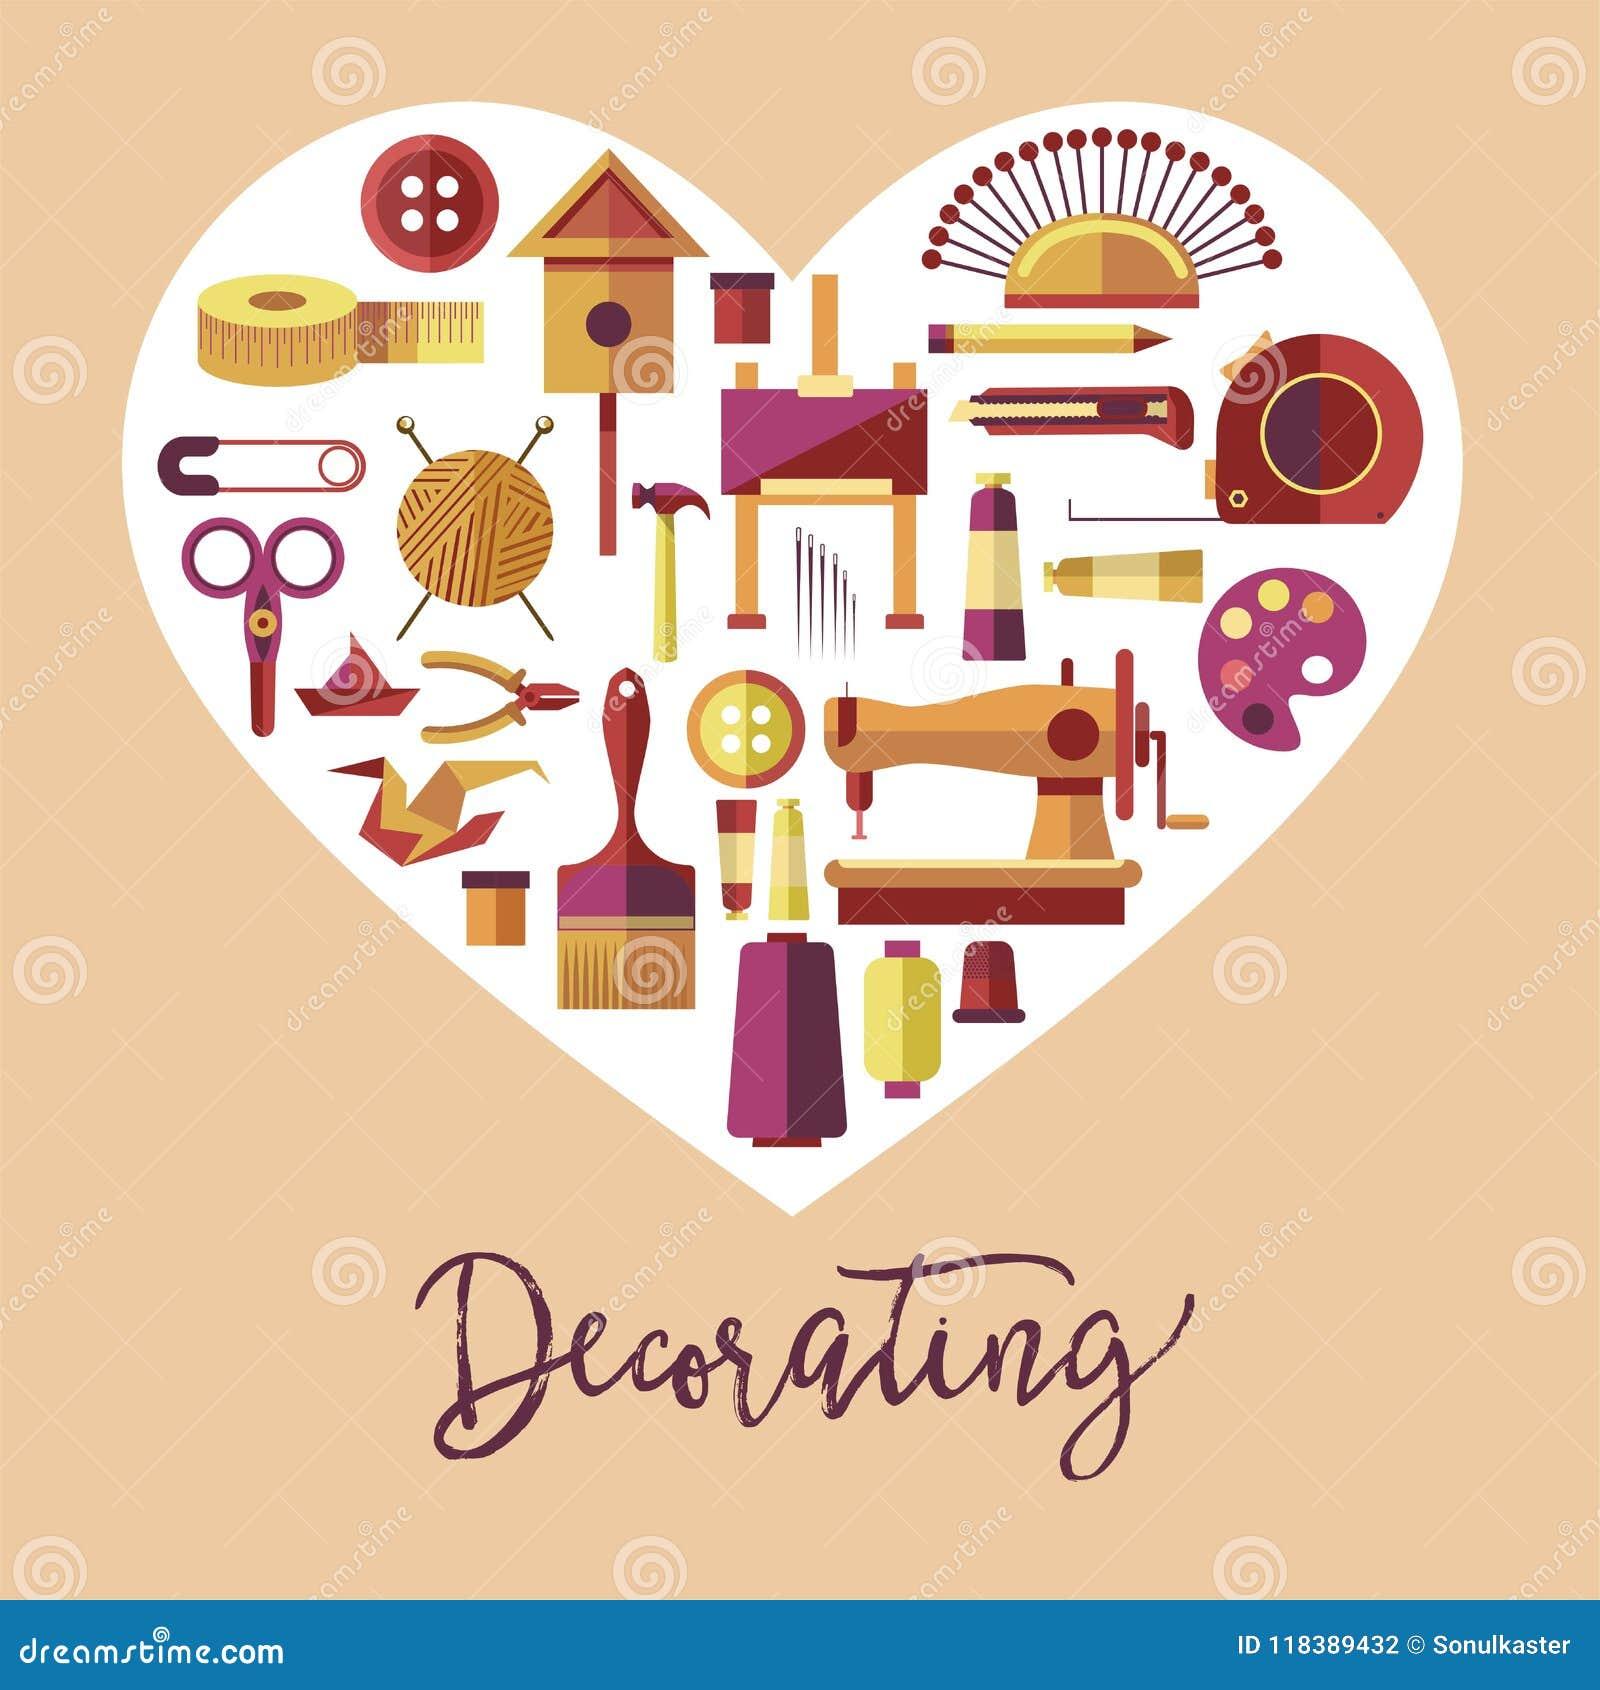 Decorating Art And Handicraft Hobby Vector Poster Stock Vector